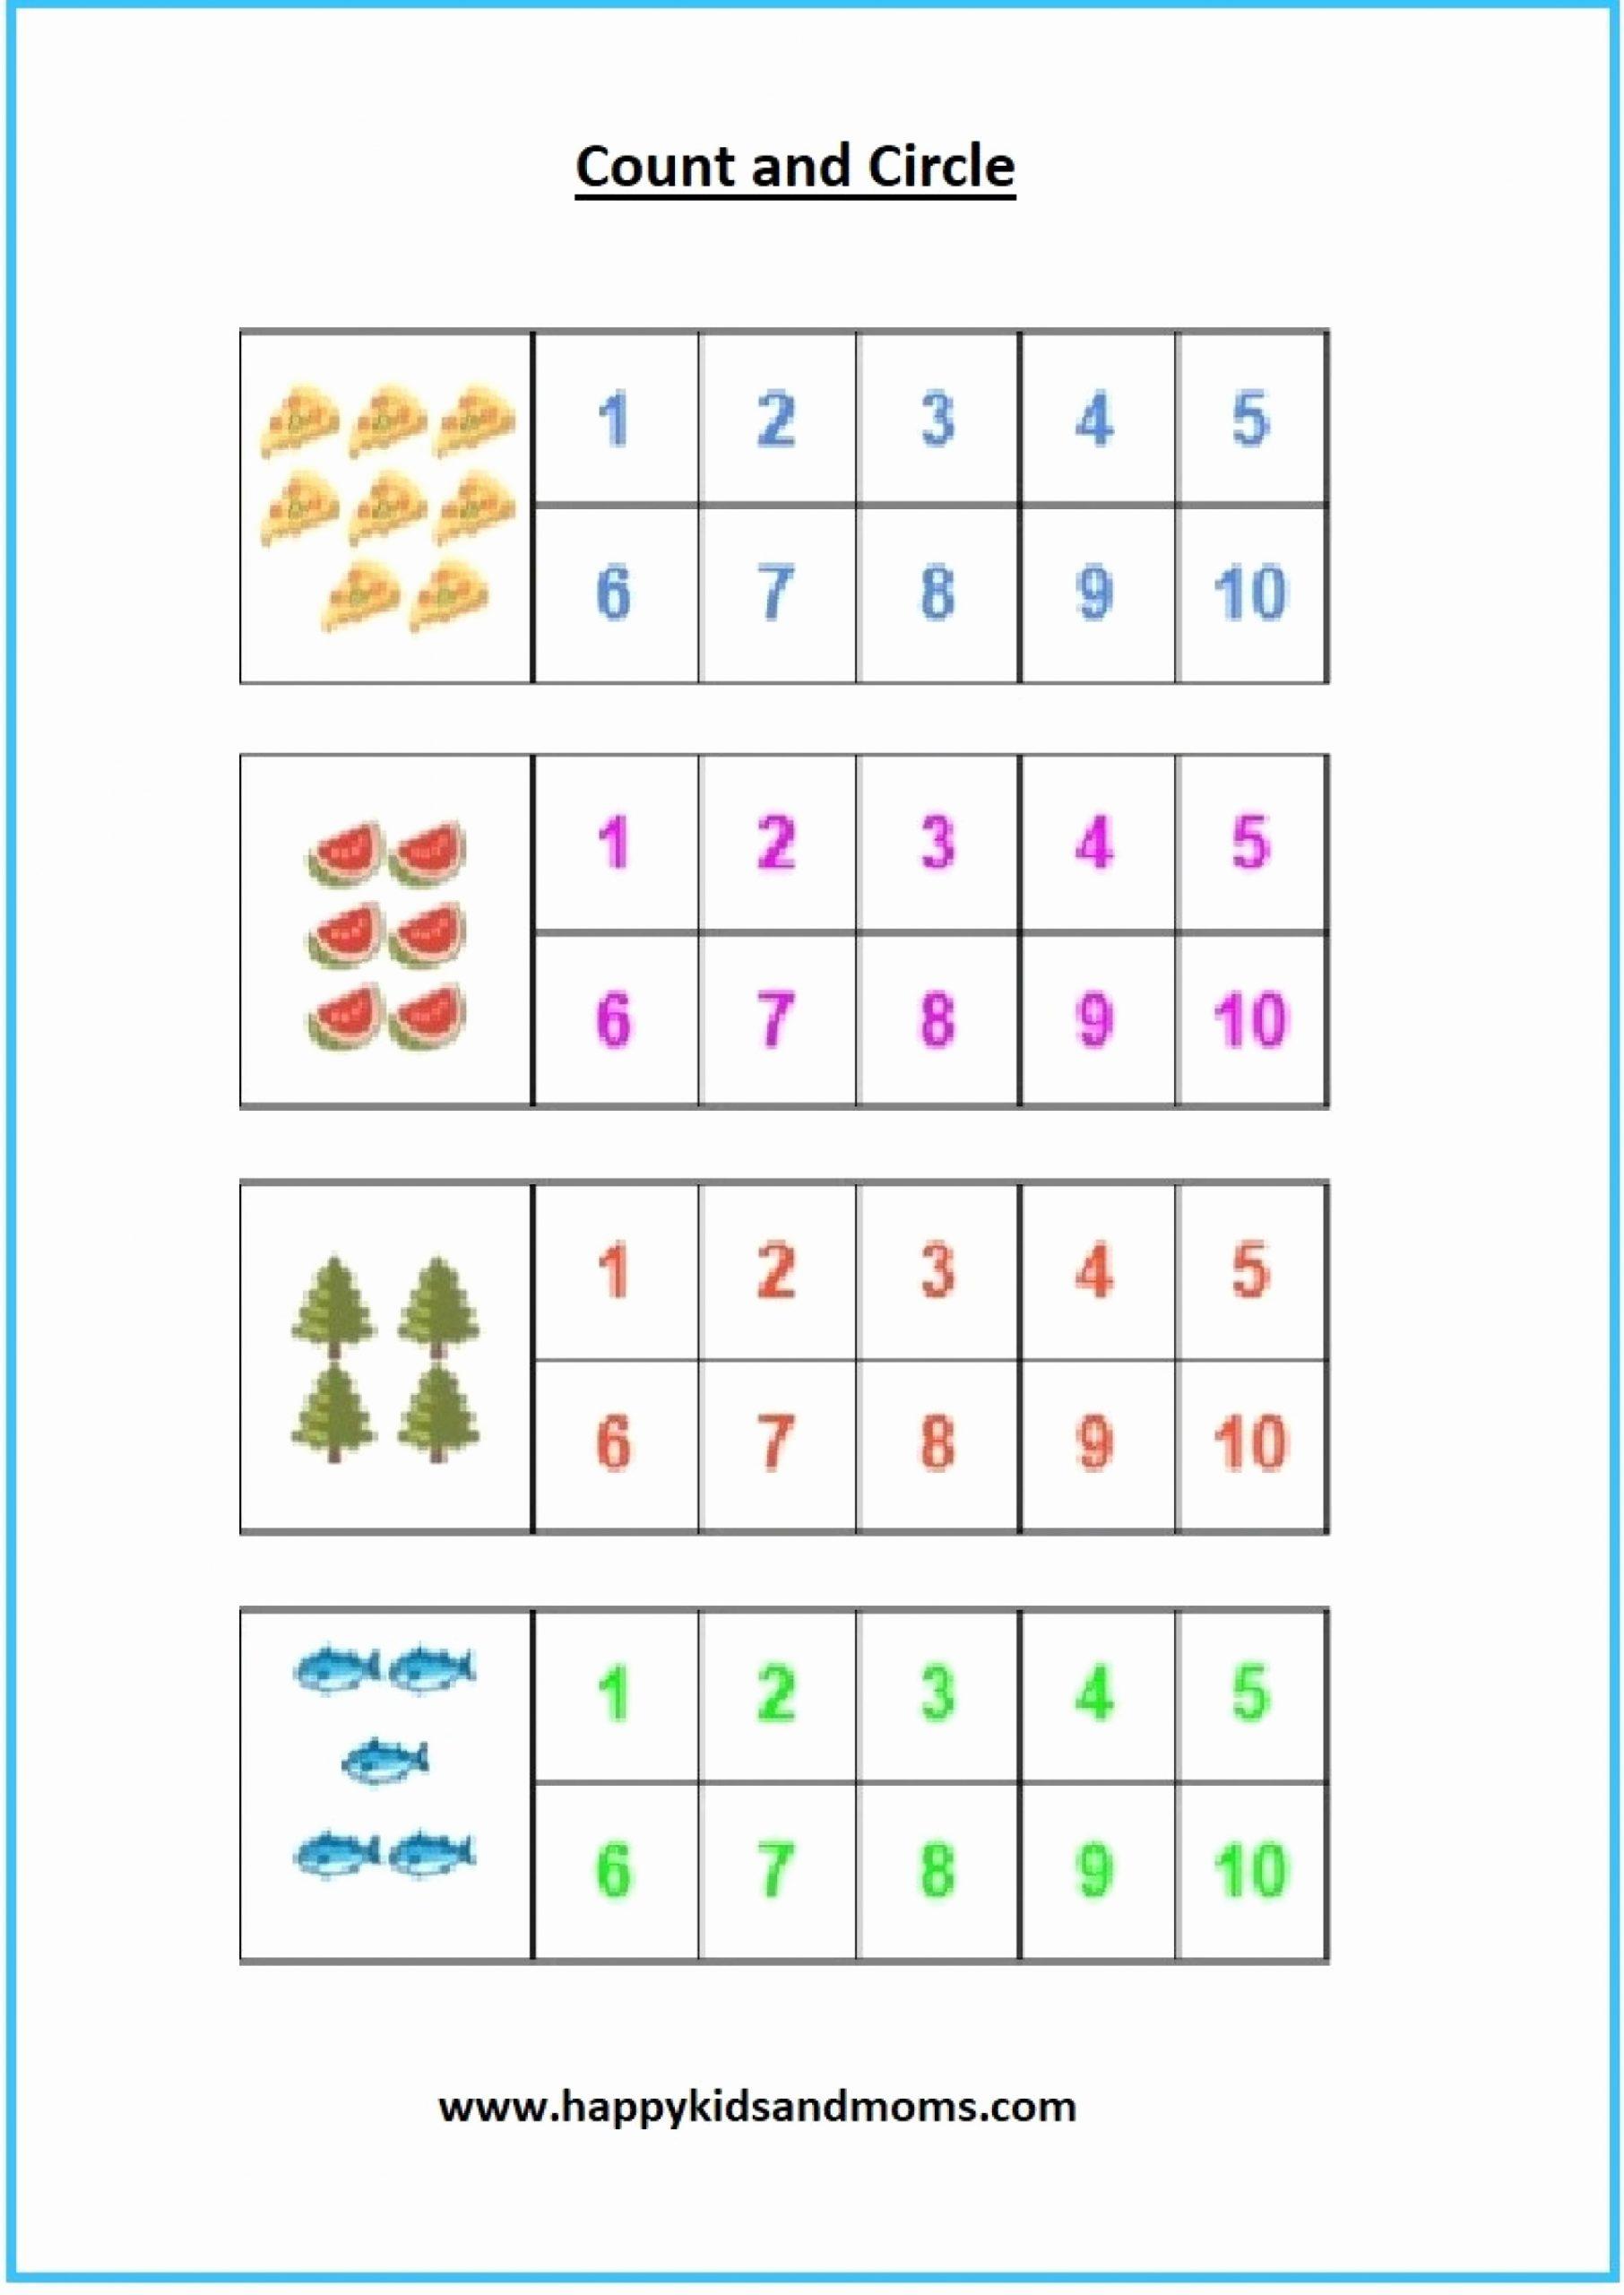 Kindergarten Math Worksheet Pdf Beautiful Kindergarten Math Worksheets Pdf to You Kindergarten Math